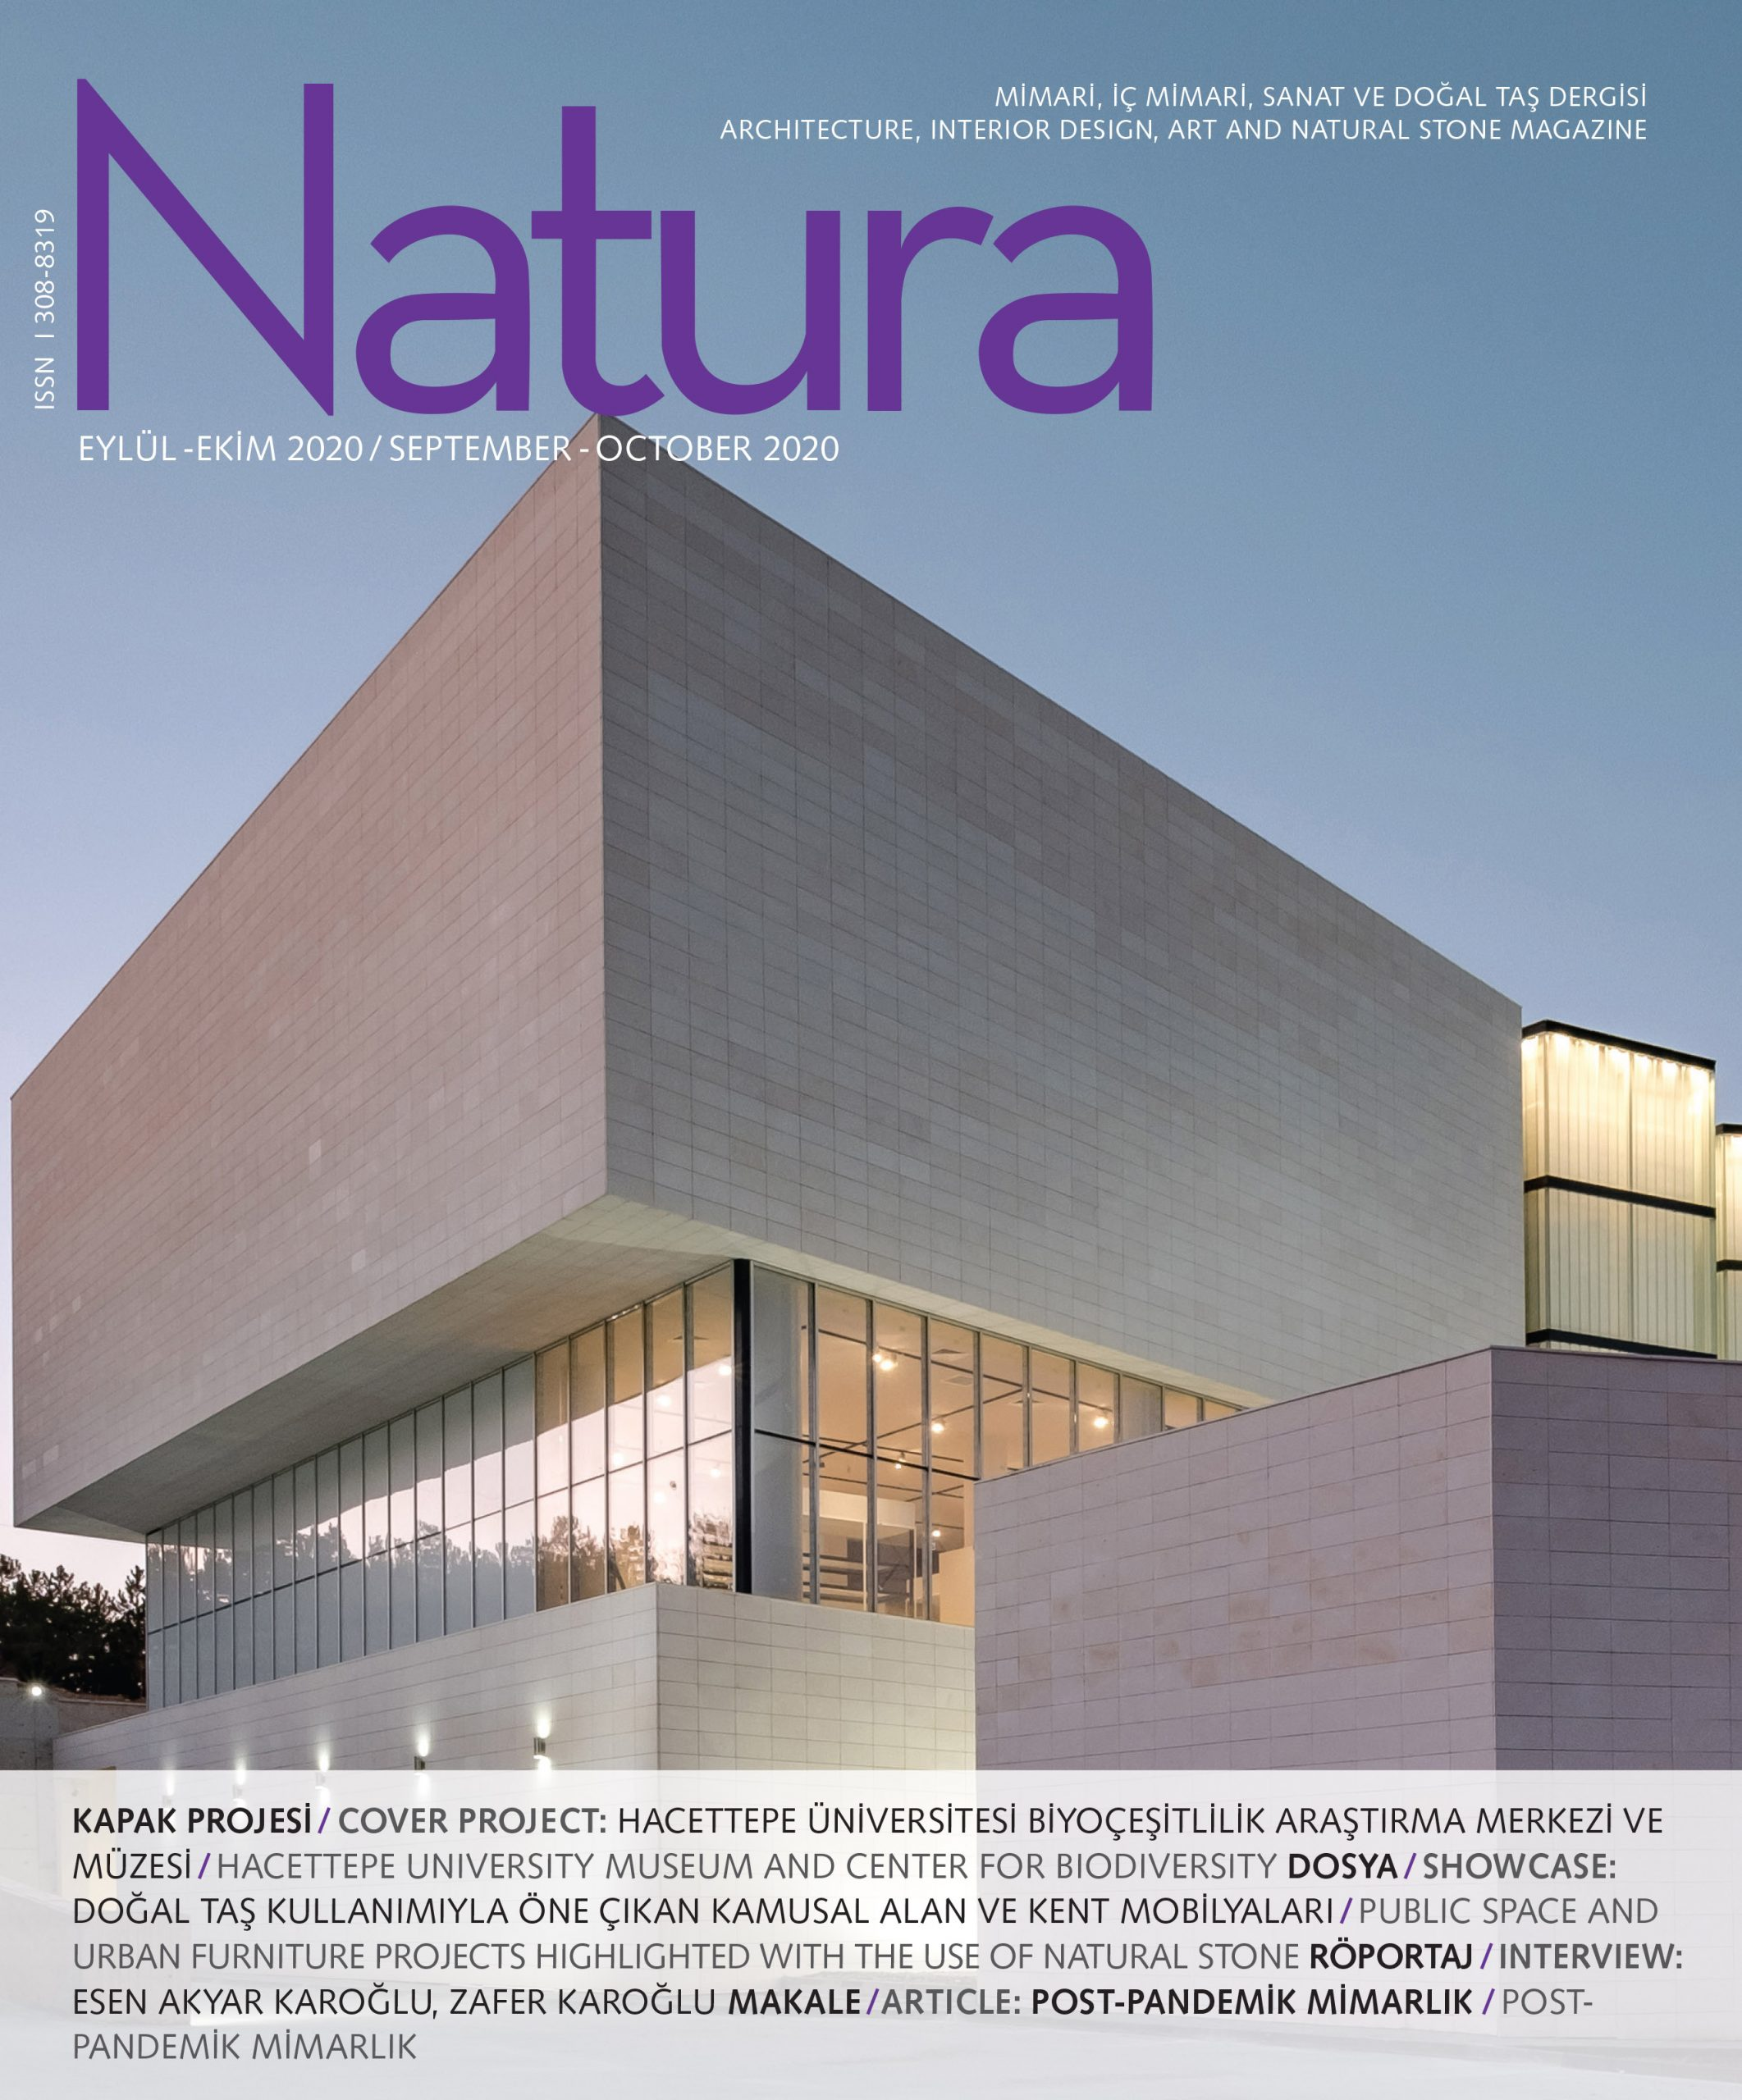 Natura Eylül-Ekim / Natura September-October